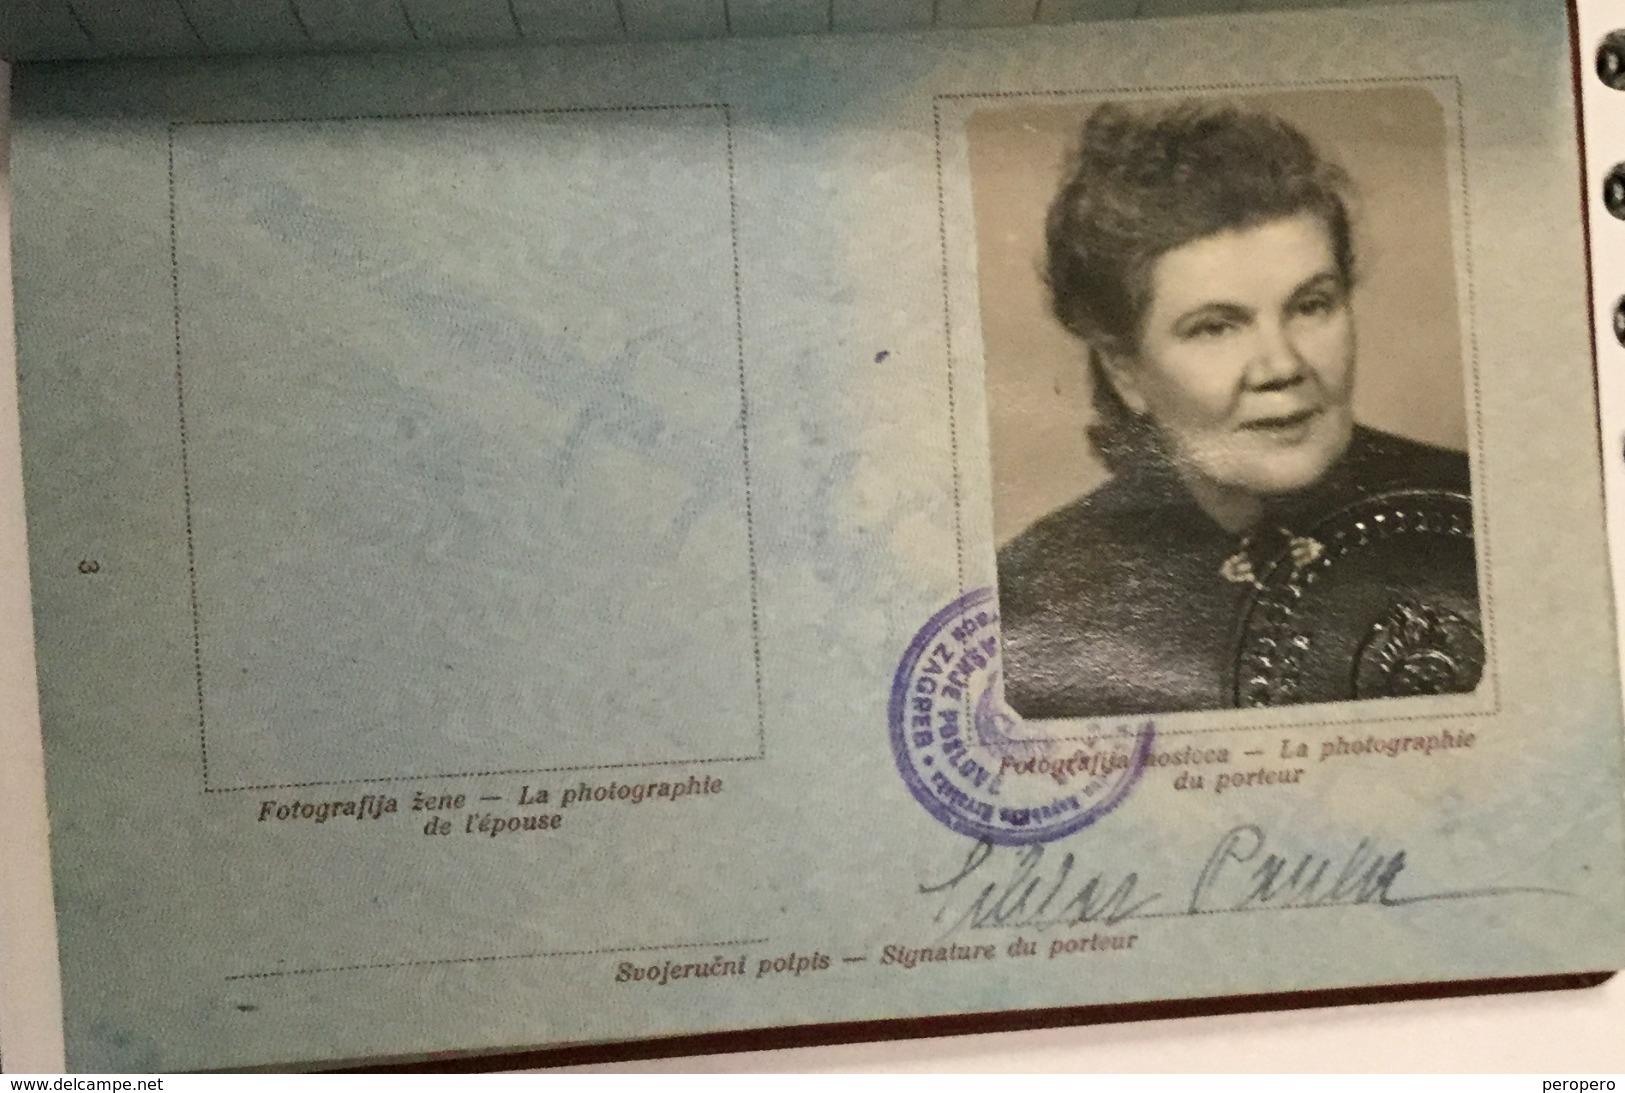 PASSPORT   REISEPASS  PASSAPORTO   PASSEPORT VISA TO:  ITALIA , AUSTRIA - Historische Dokumente